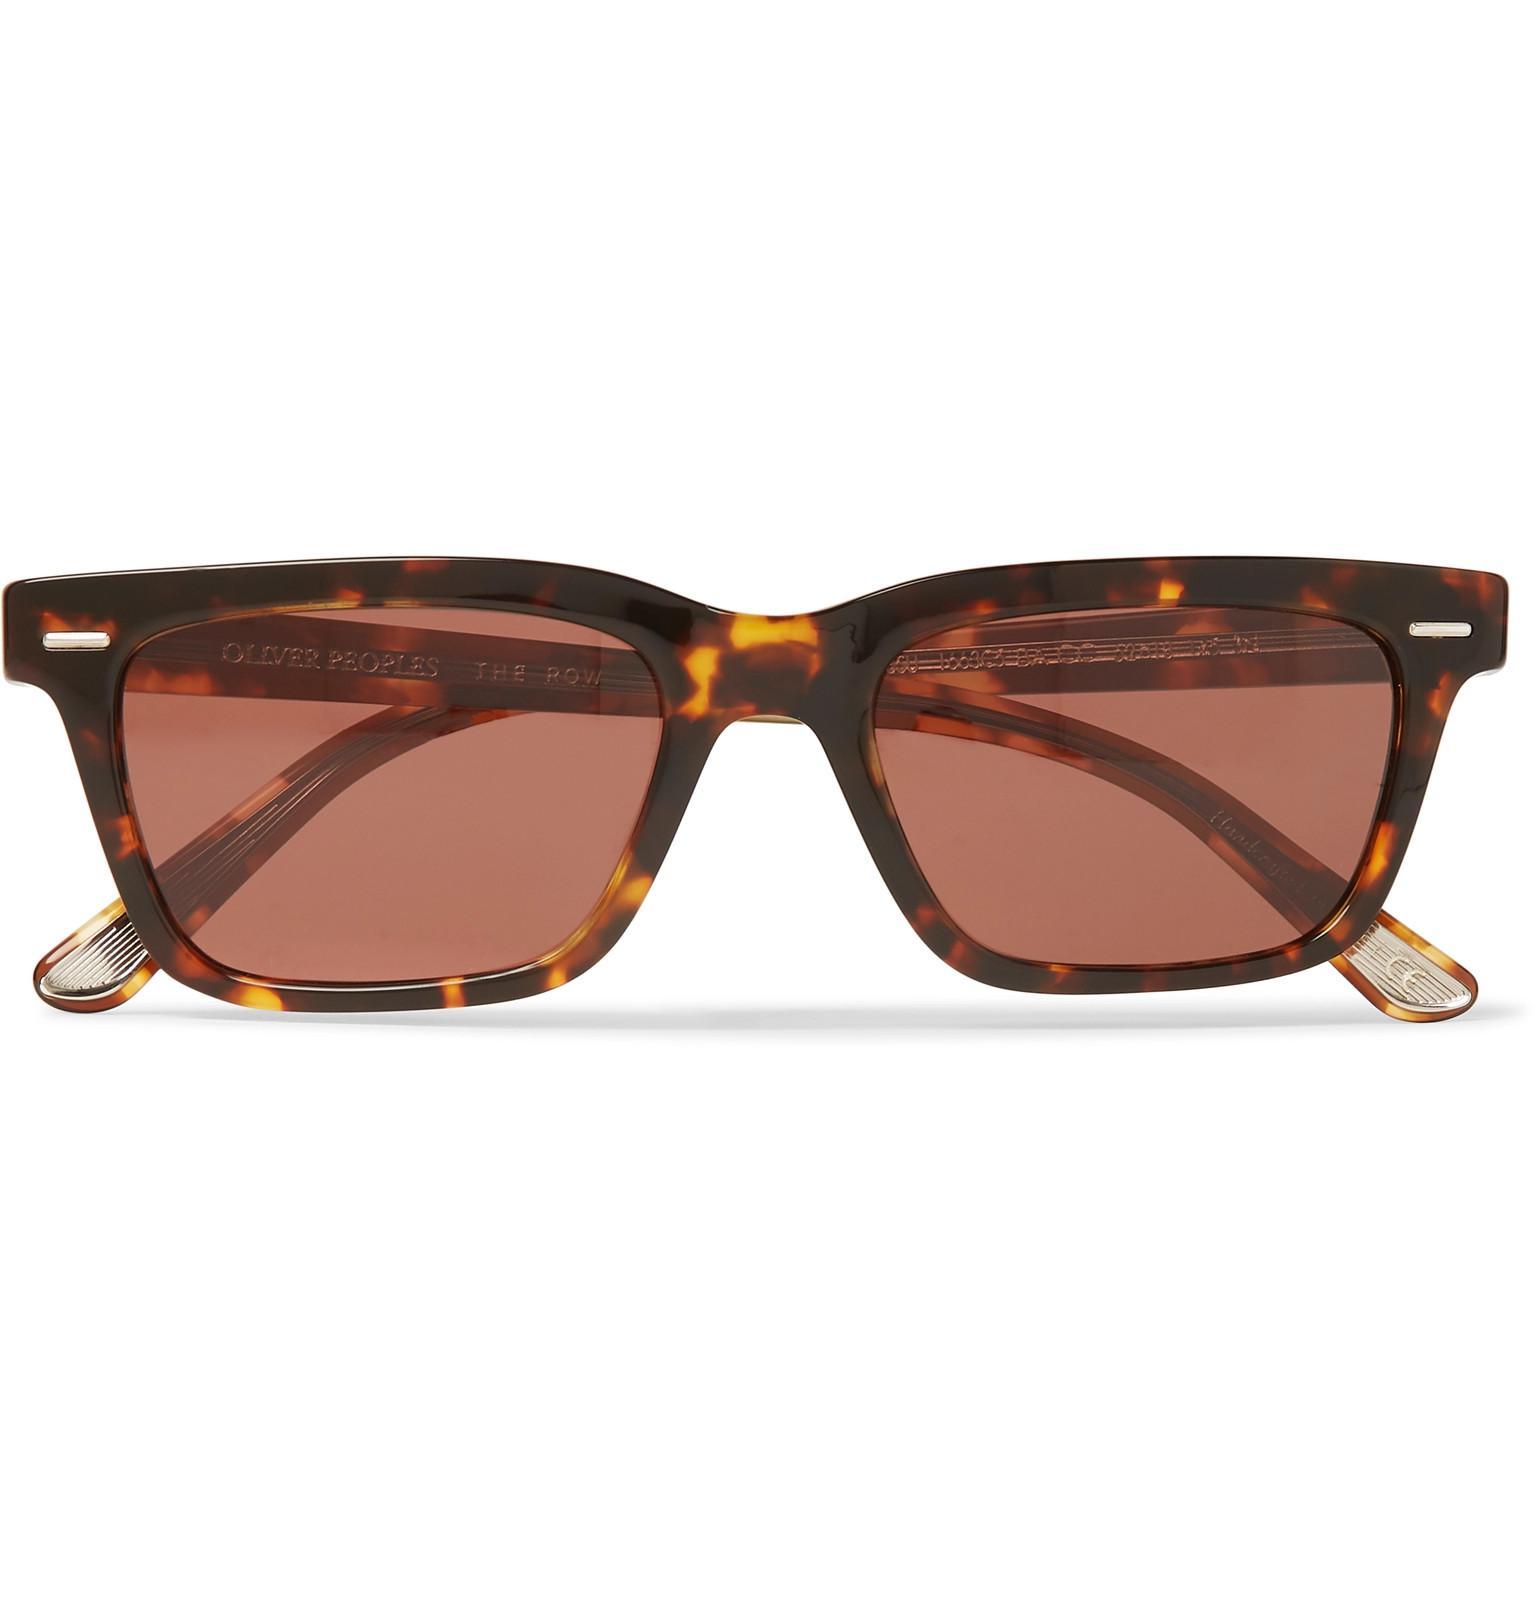 8f282519f44e The Row. Men s Brown + Oliver Peoples Ba Cc Square-frame Tortoiseshell Acetate  Sunglasses